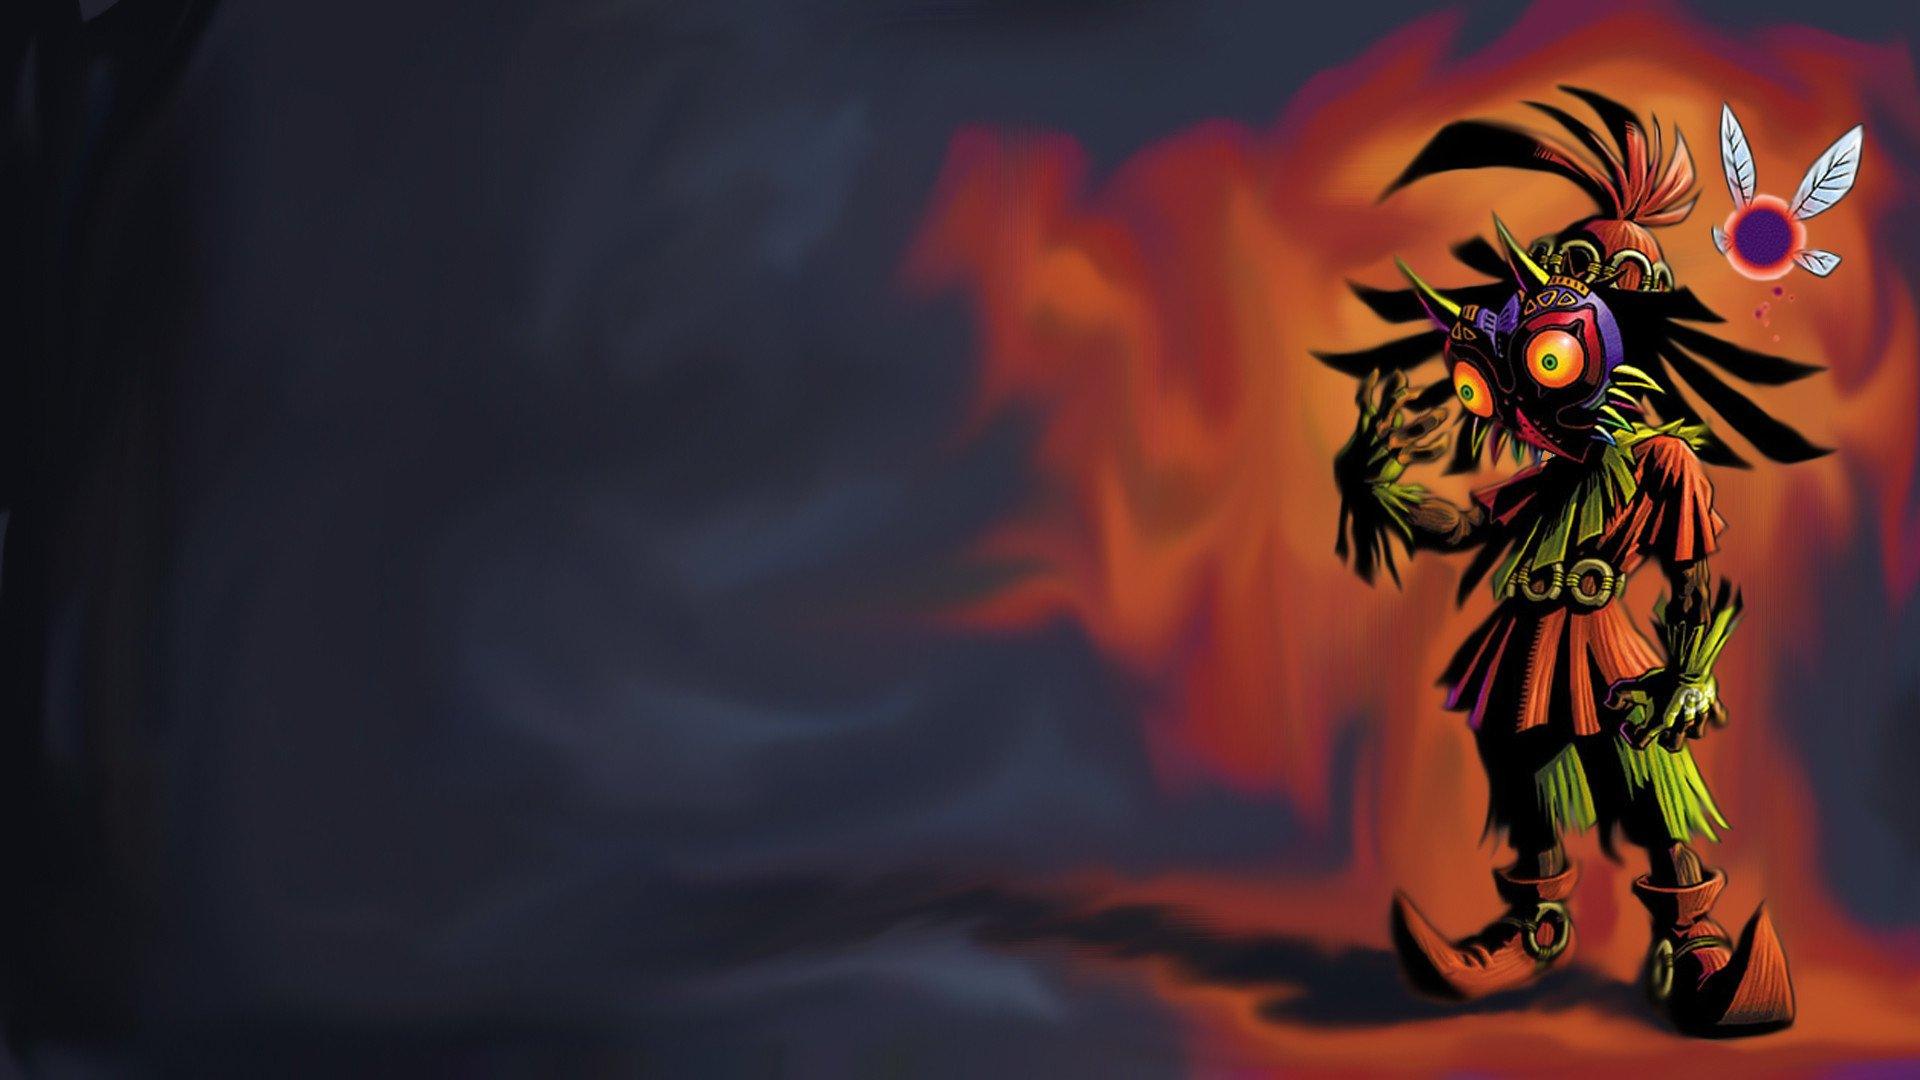 72 The Legend Of Zelda Majora S Mask Hd Wallpapers Background